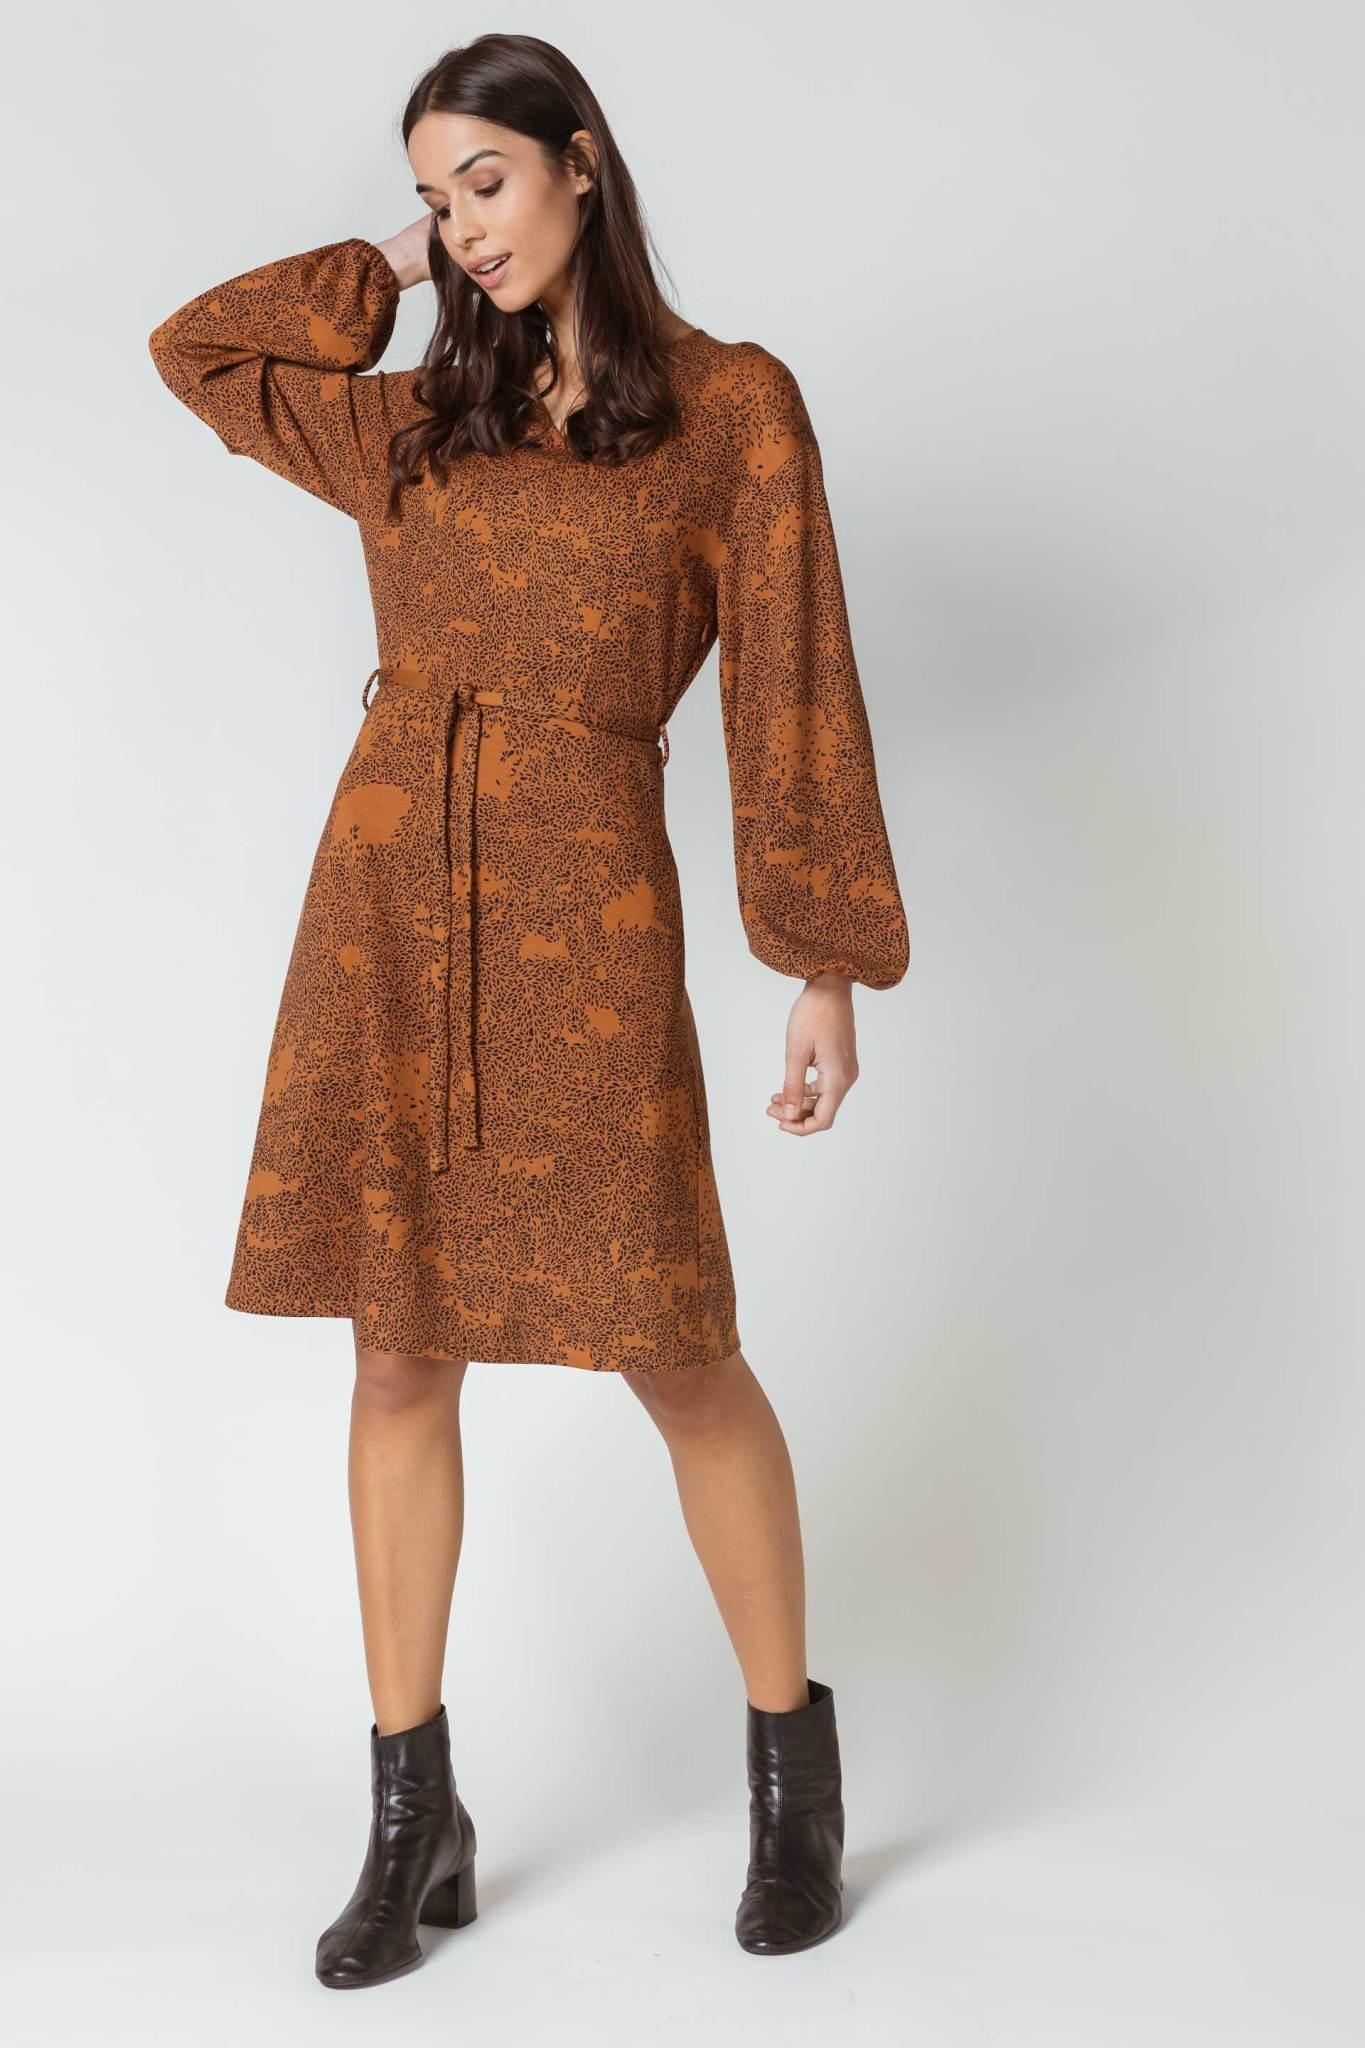 SKFK SKFK - agar women dress